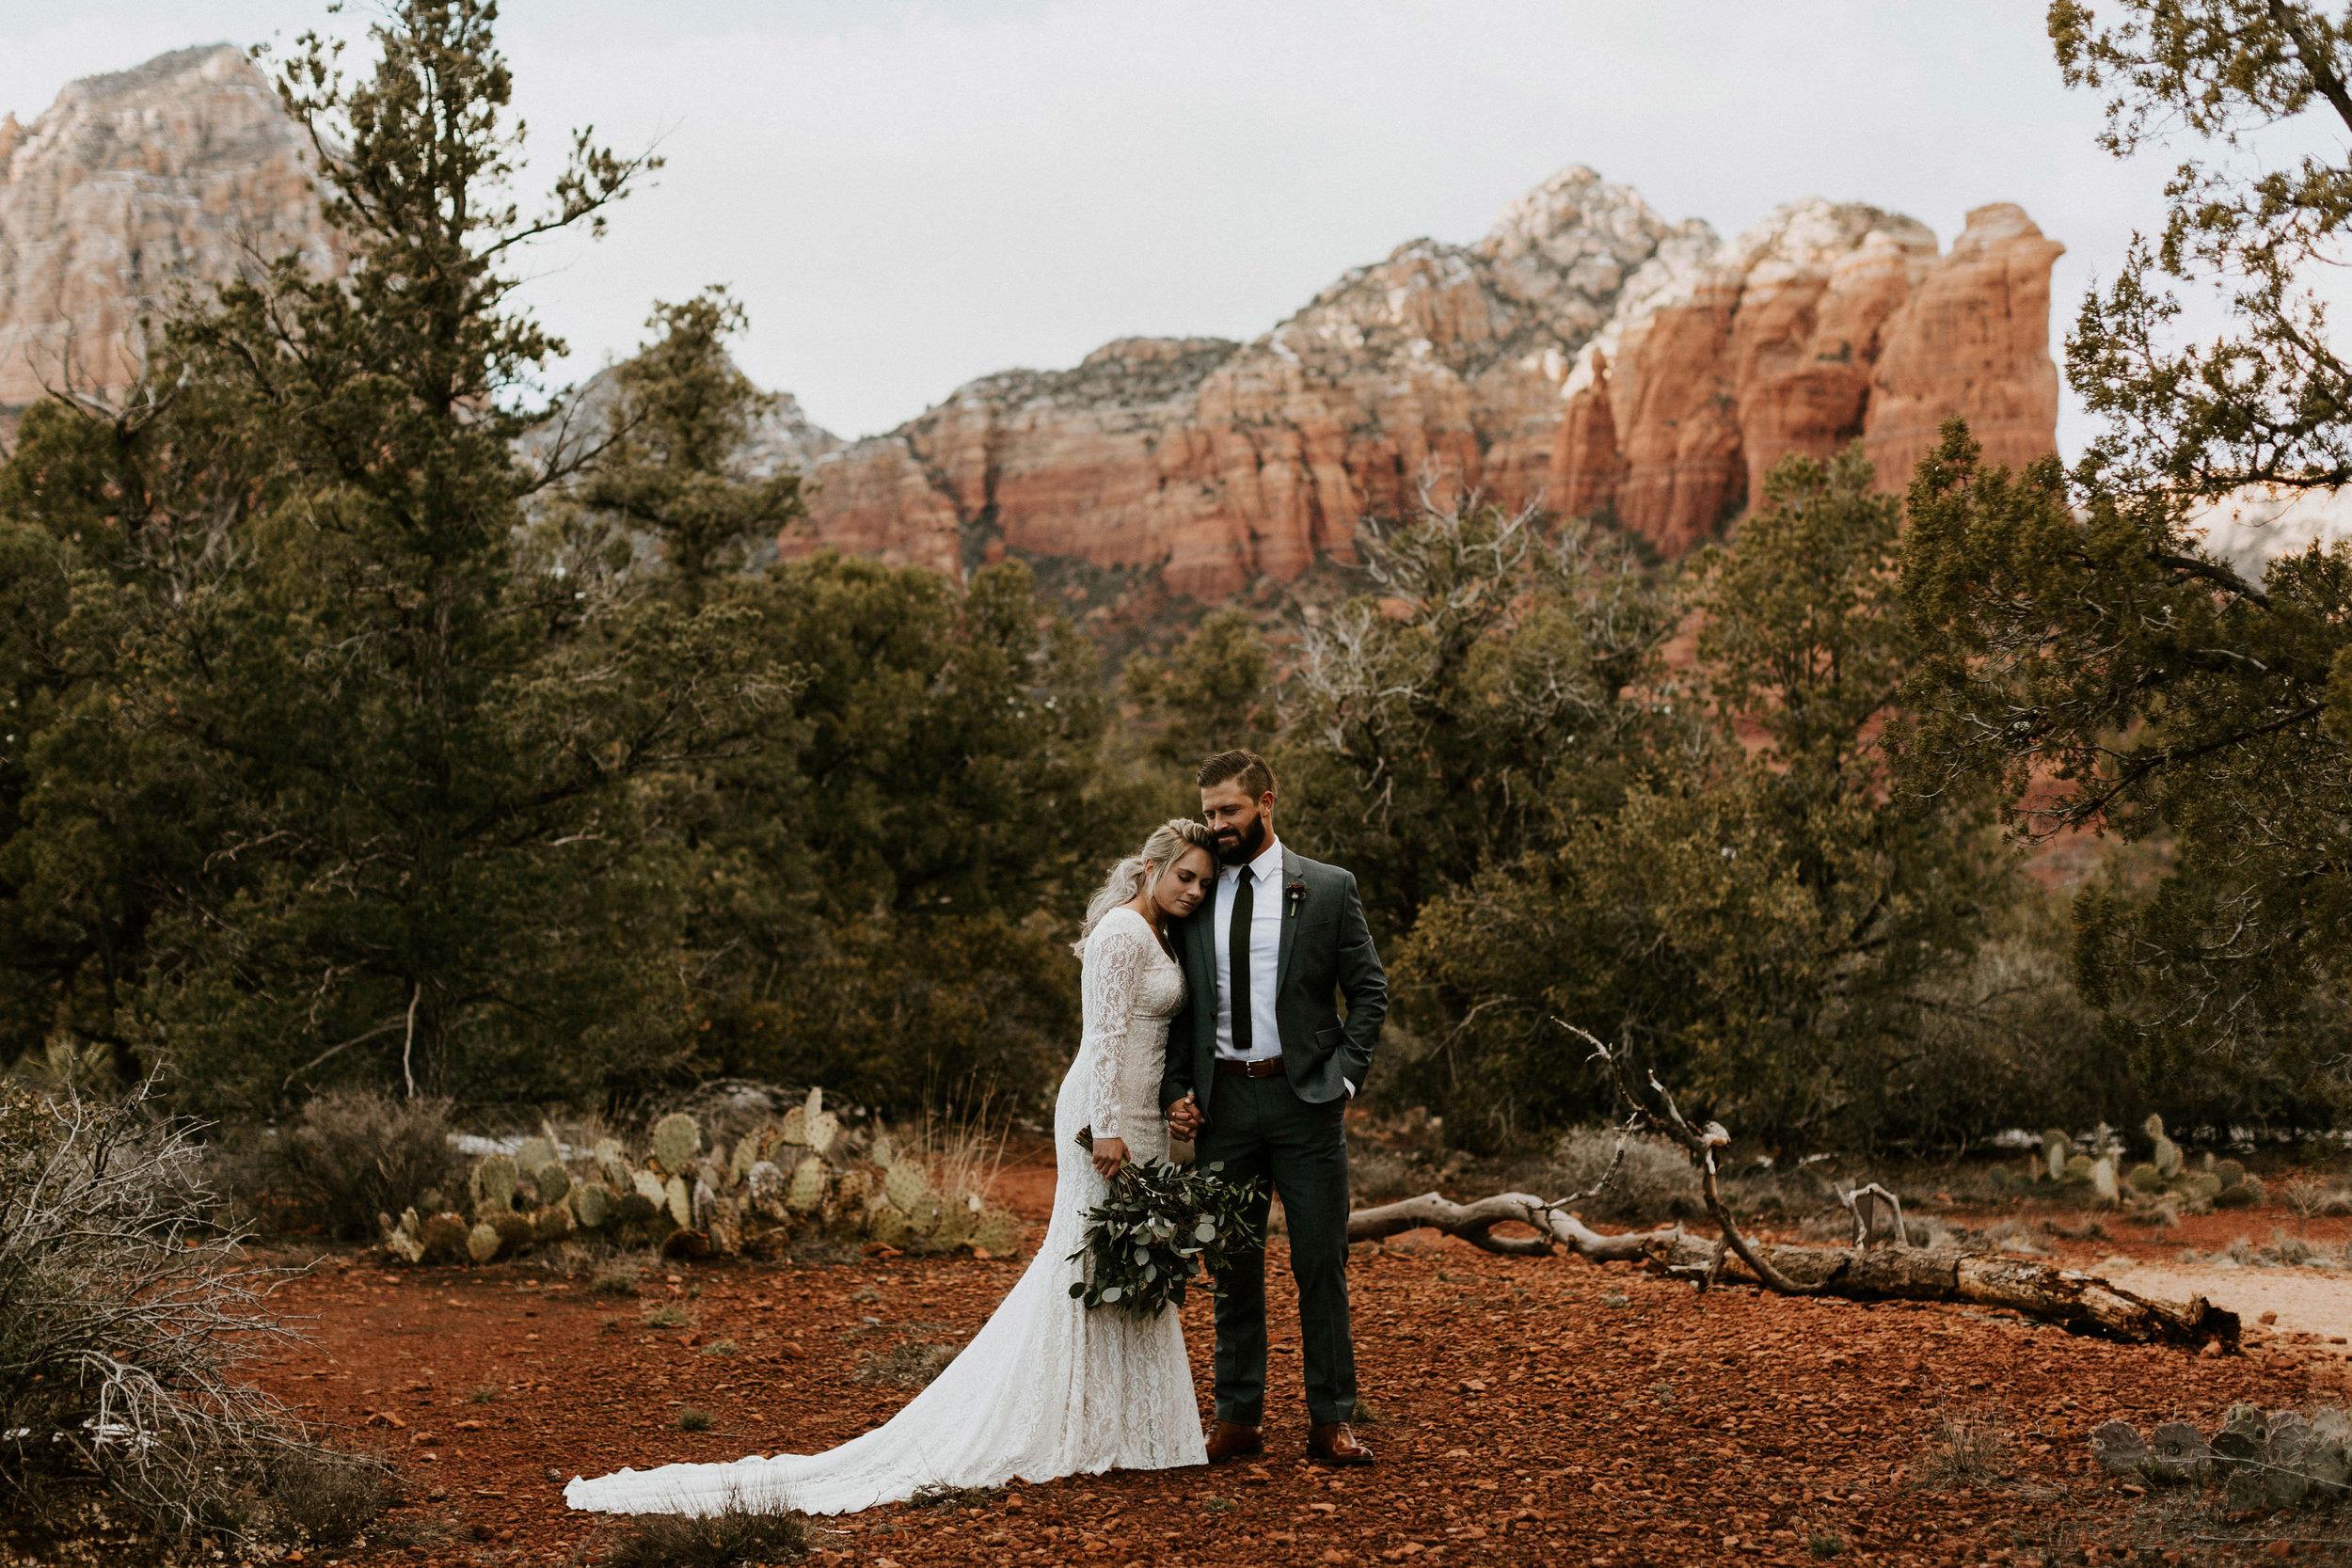 Wedding Photos in Sedona, Arizona